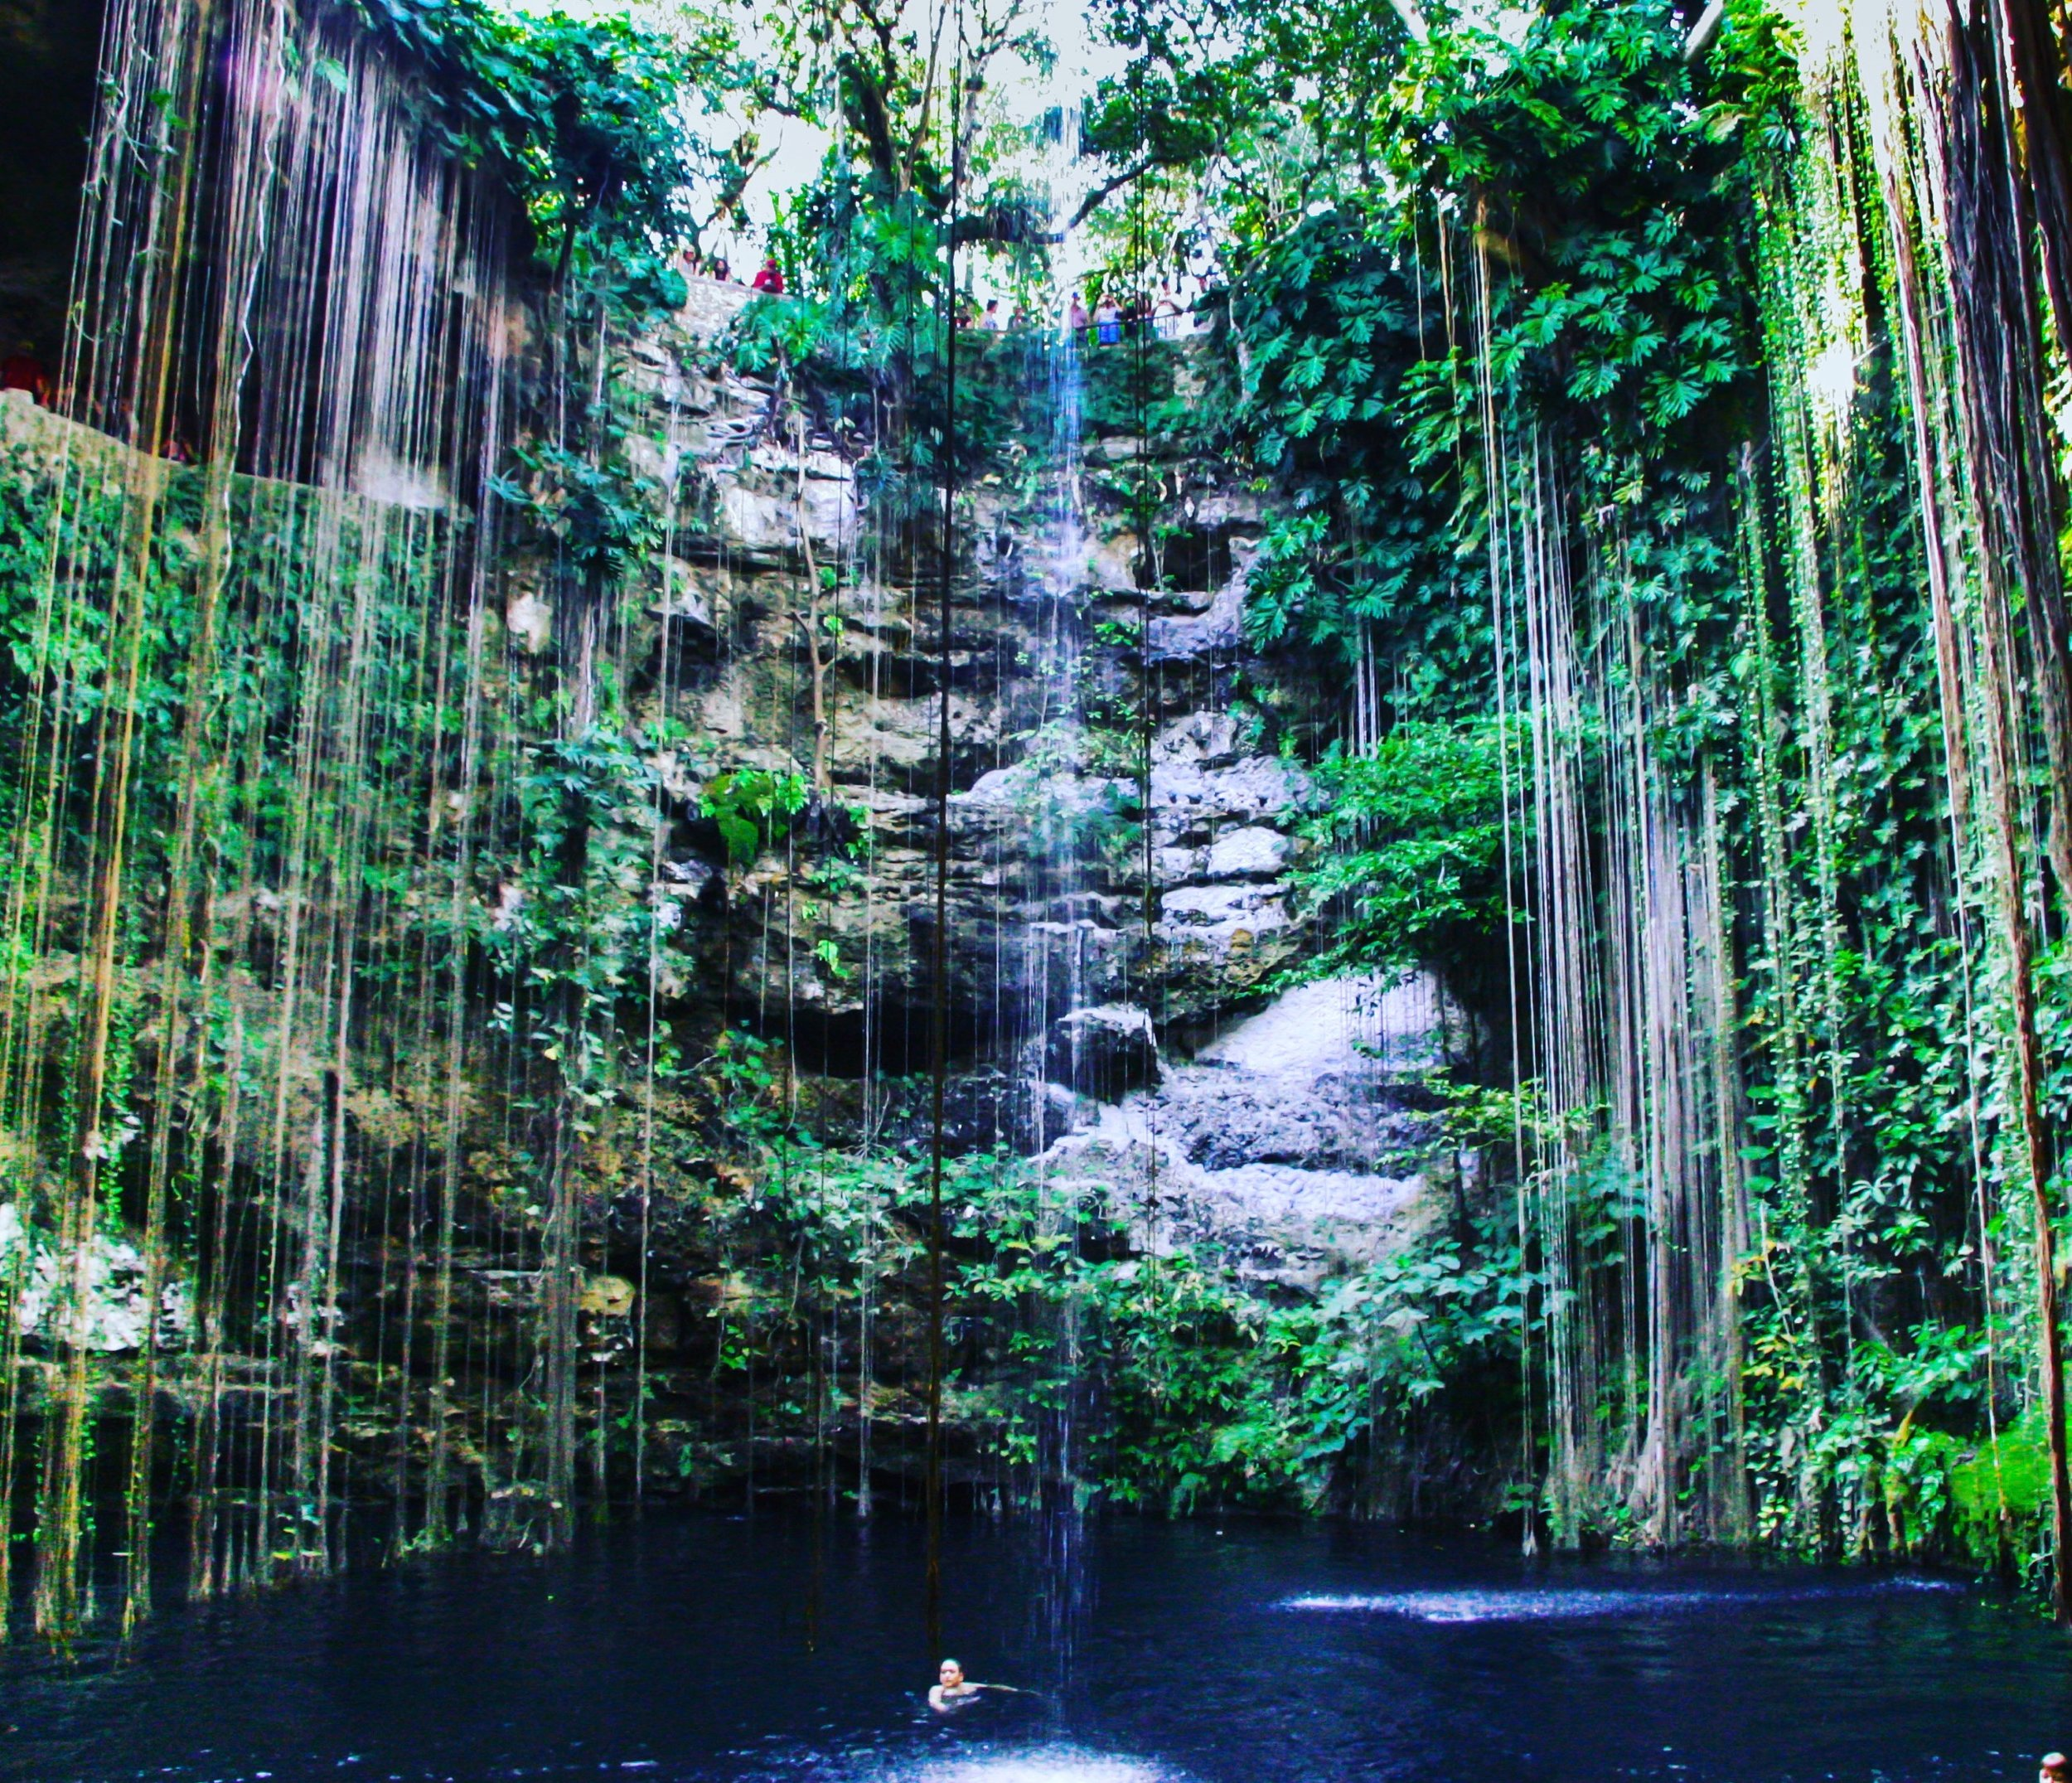 cenote-near-playa-del-carmen-riviera-maya-yucat-n-peninsula-m-xico_t20_4EvkJx.jpg